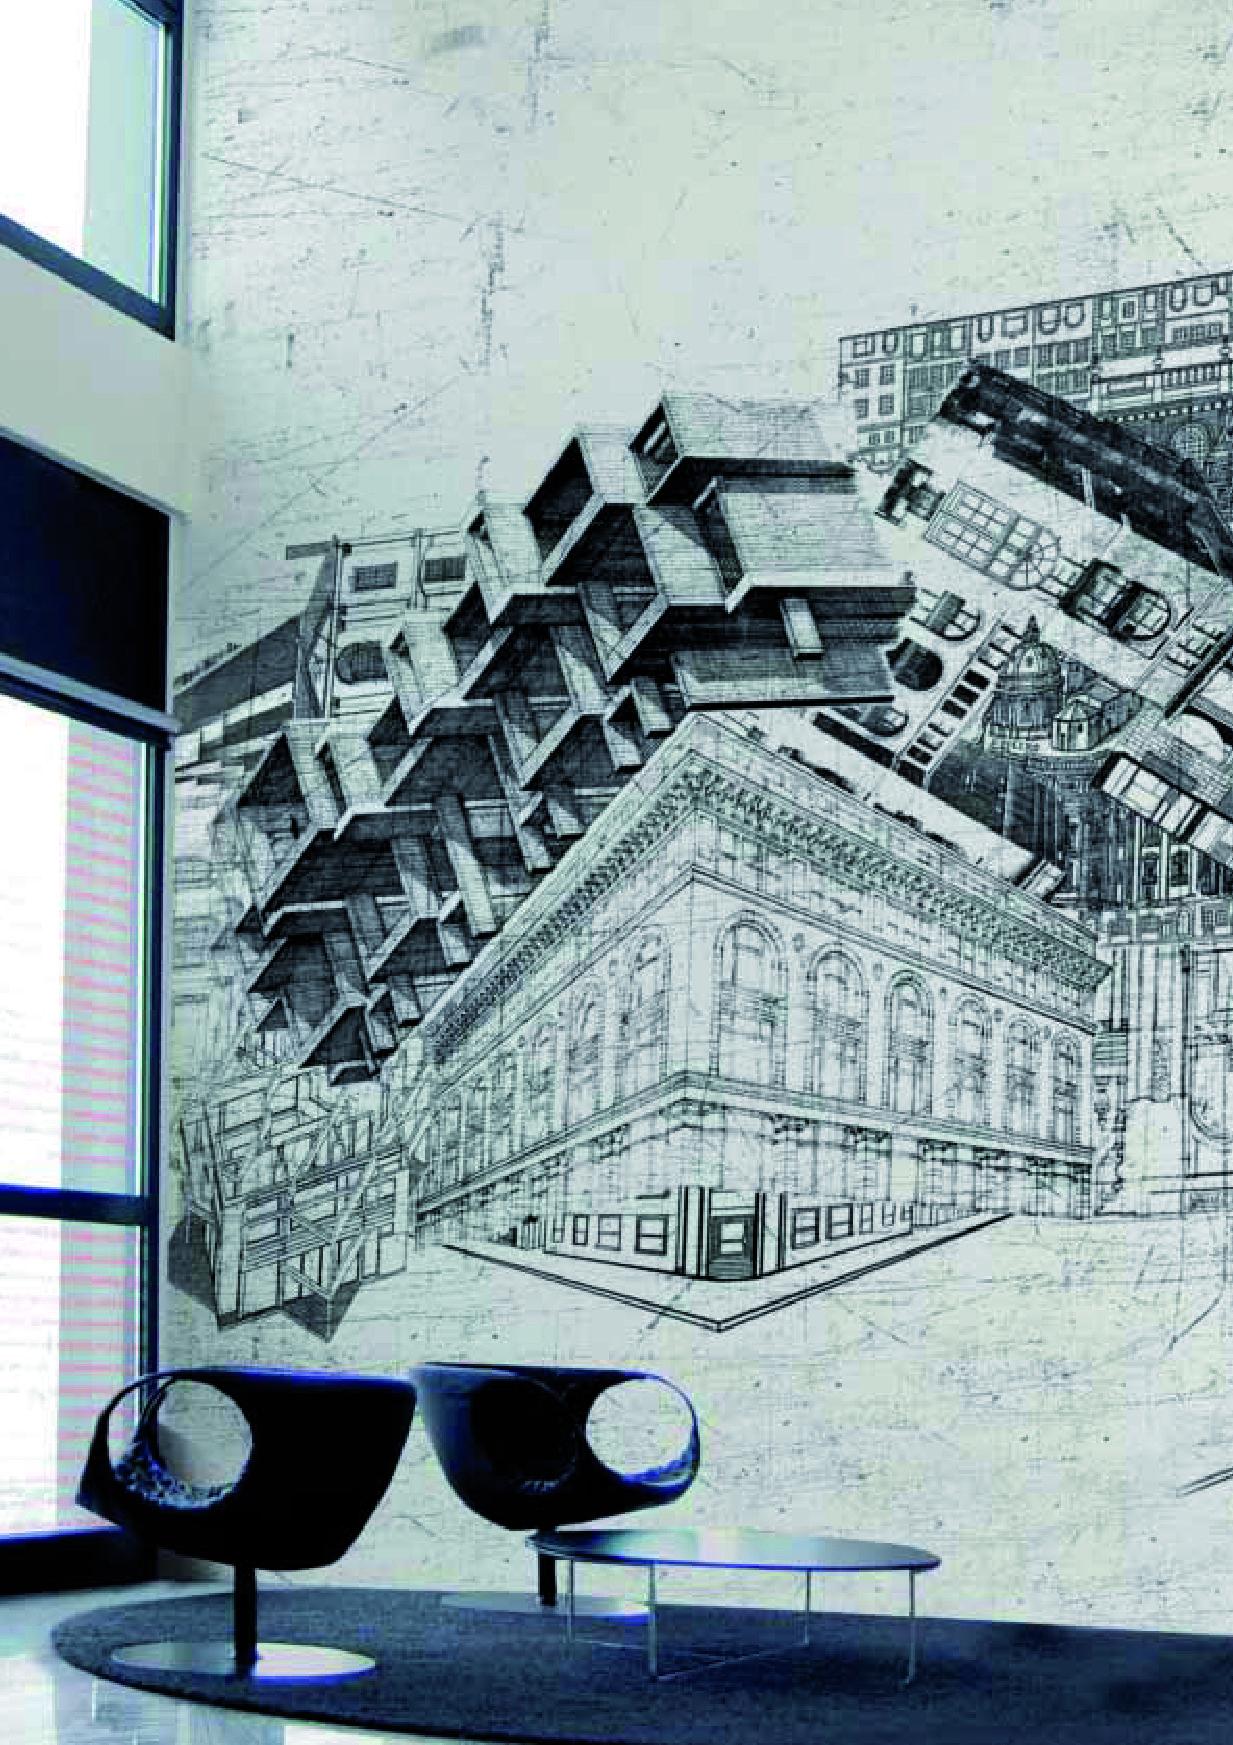 Adriani E Rossi Carta Da Parati wallpaper art - carta da parati firmata adriani e rossi